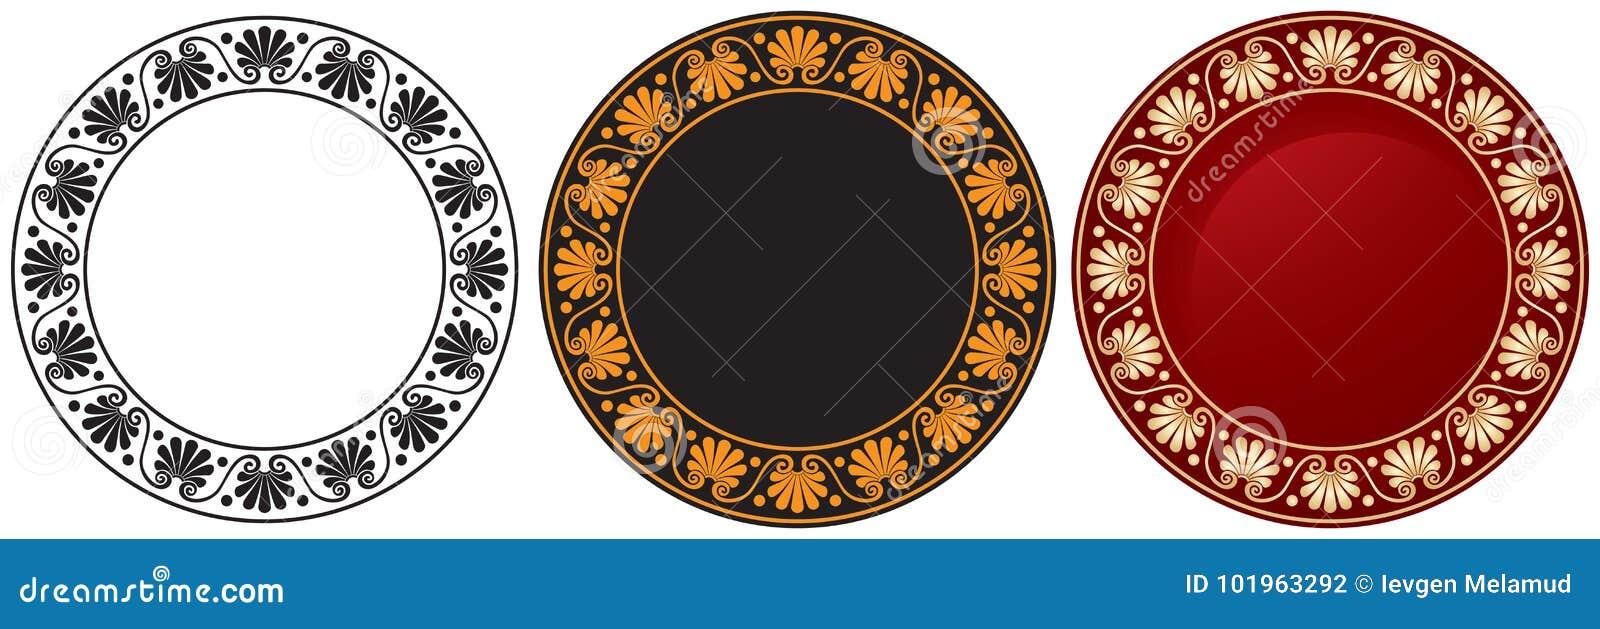 Ancient Greek Circle Ornament Stock Vector Illustration Of Black